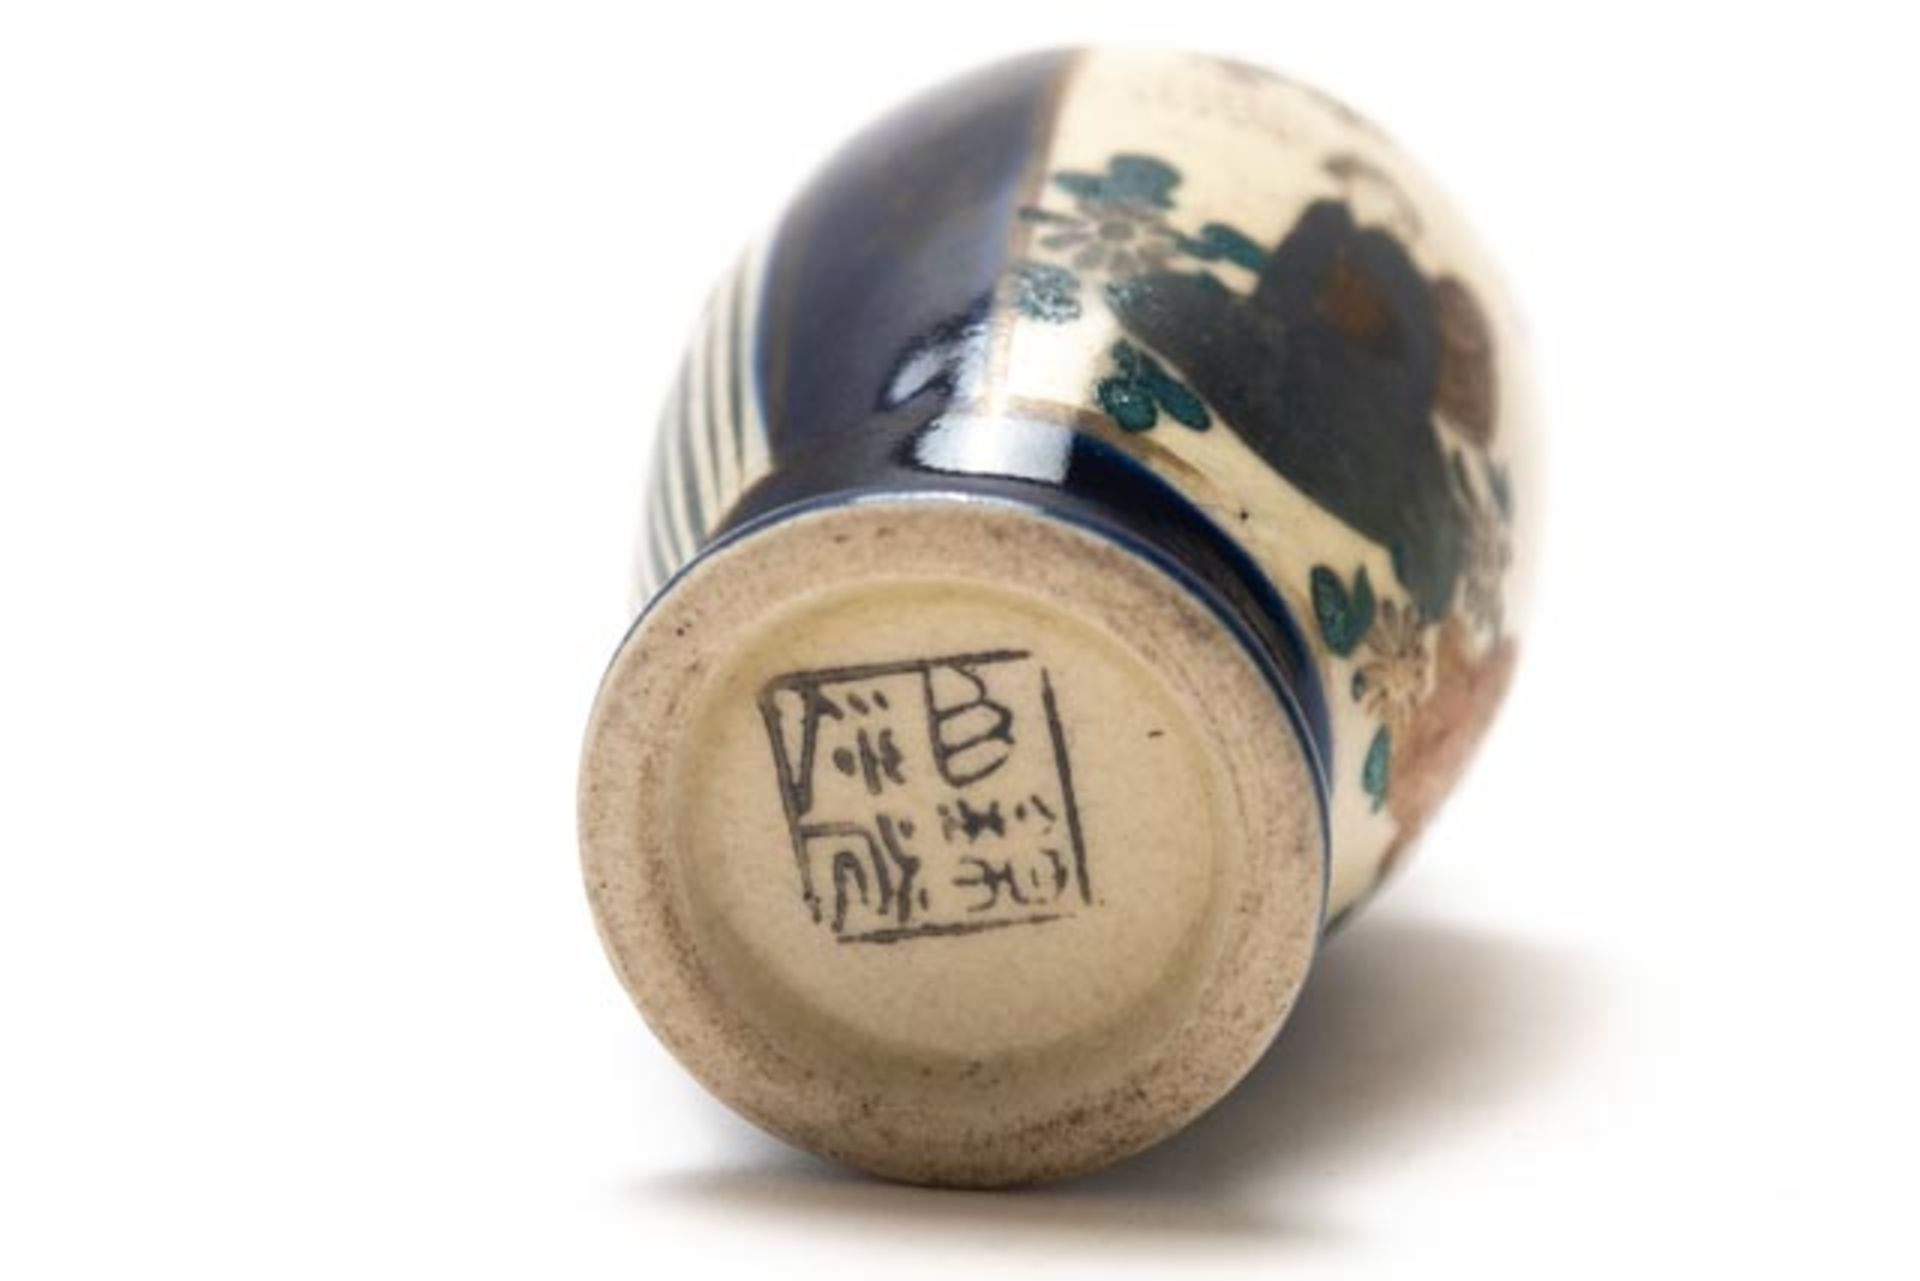 Chinesische Vase - Image 5 of 5